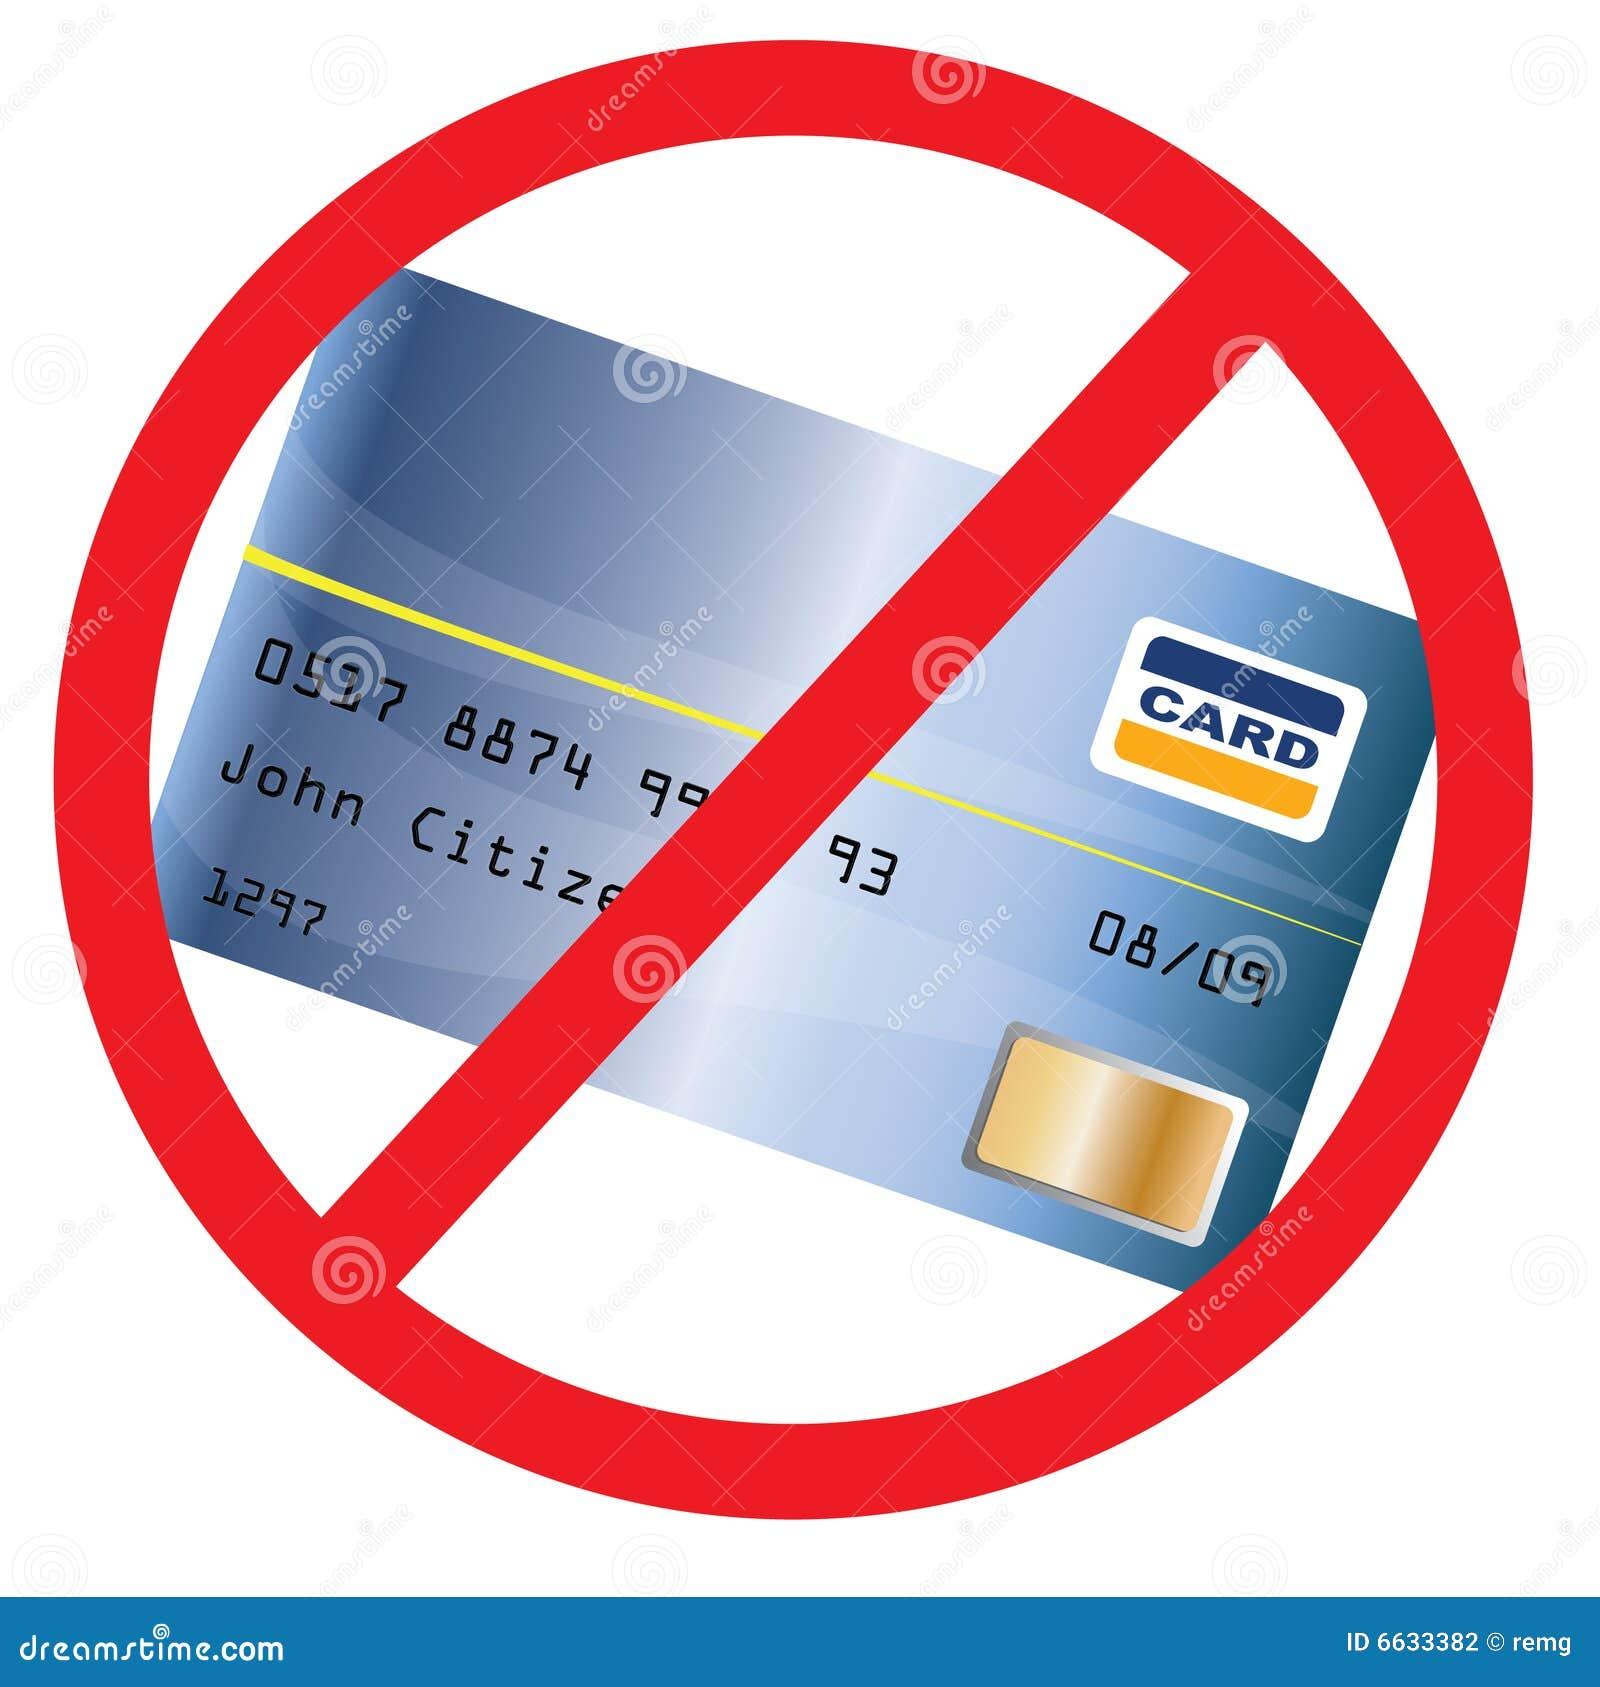 Pas de carte de crédit hentai